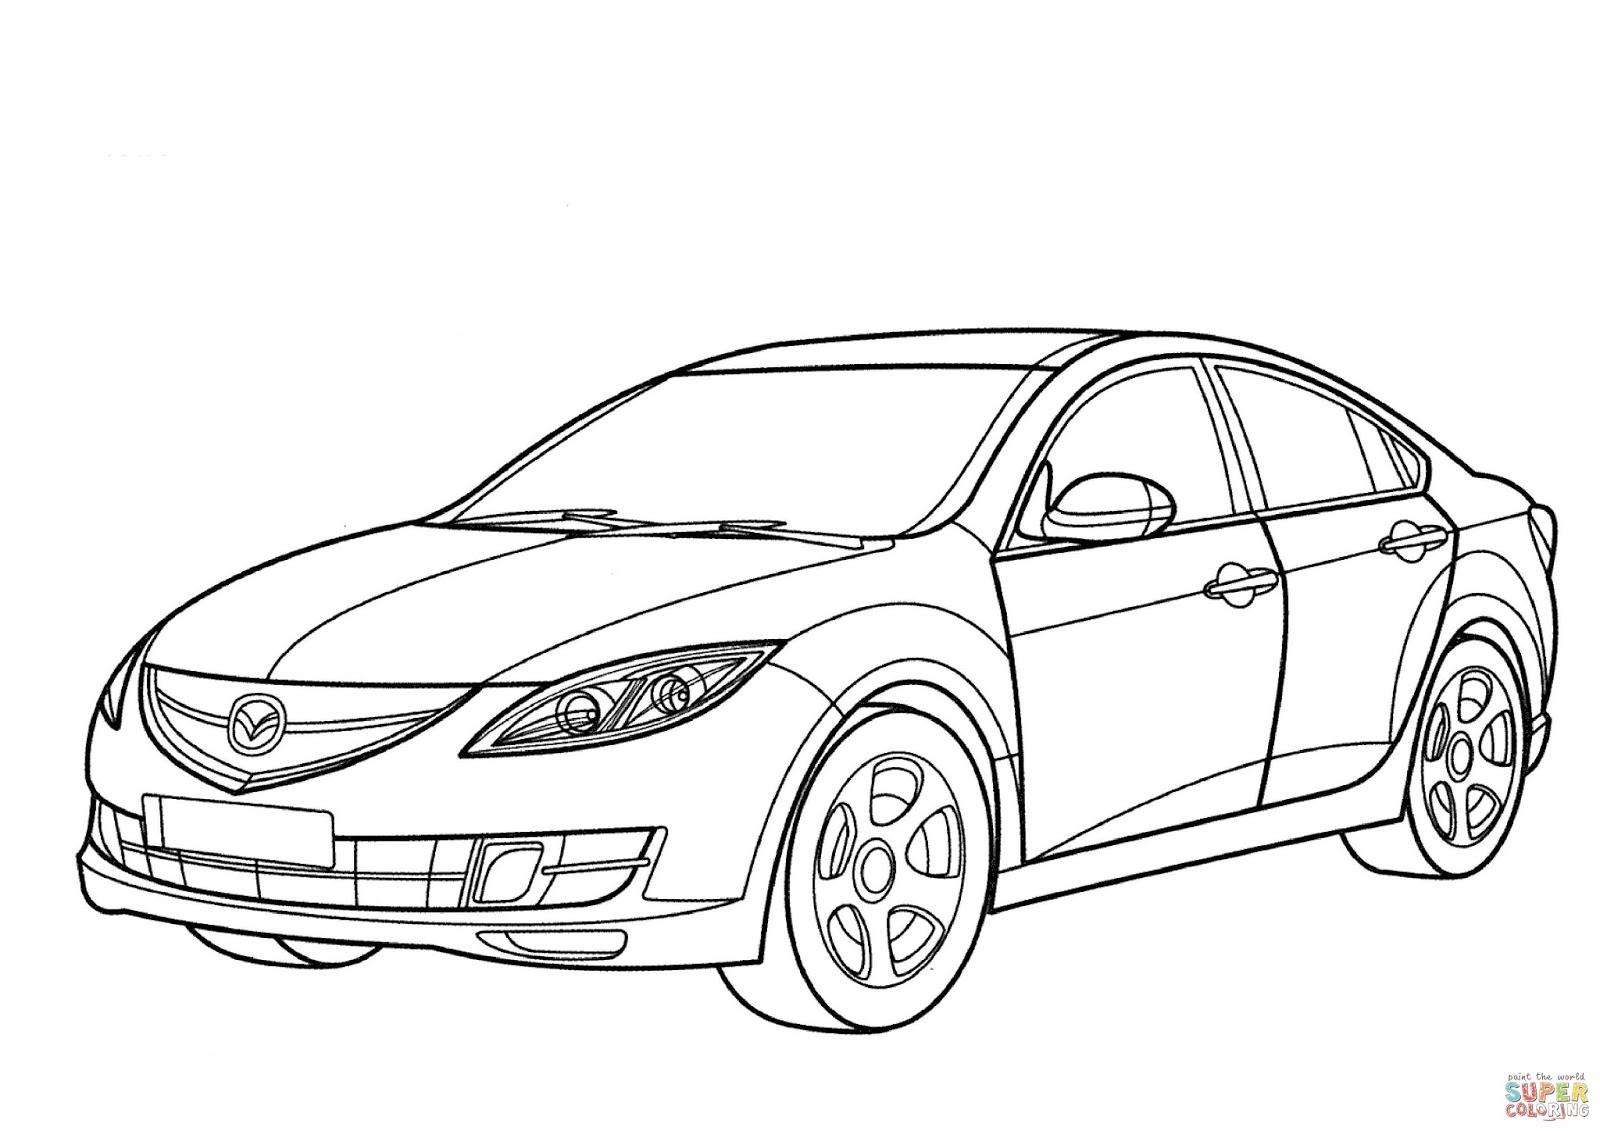 Kumpulan Gambar Sketsa Mobil Lawas